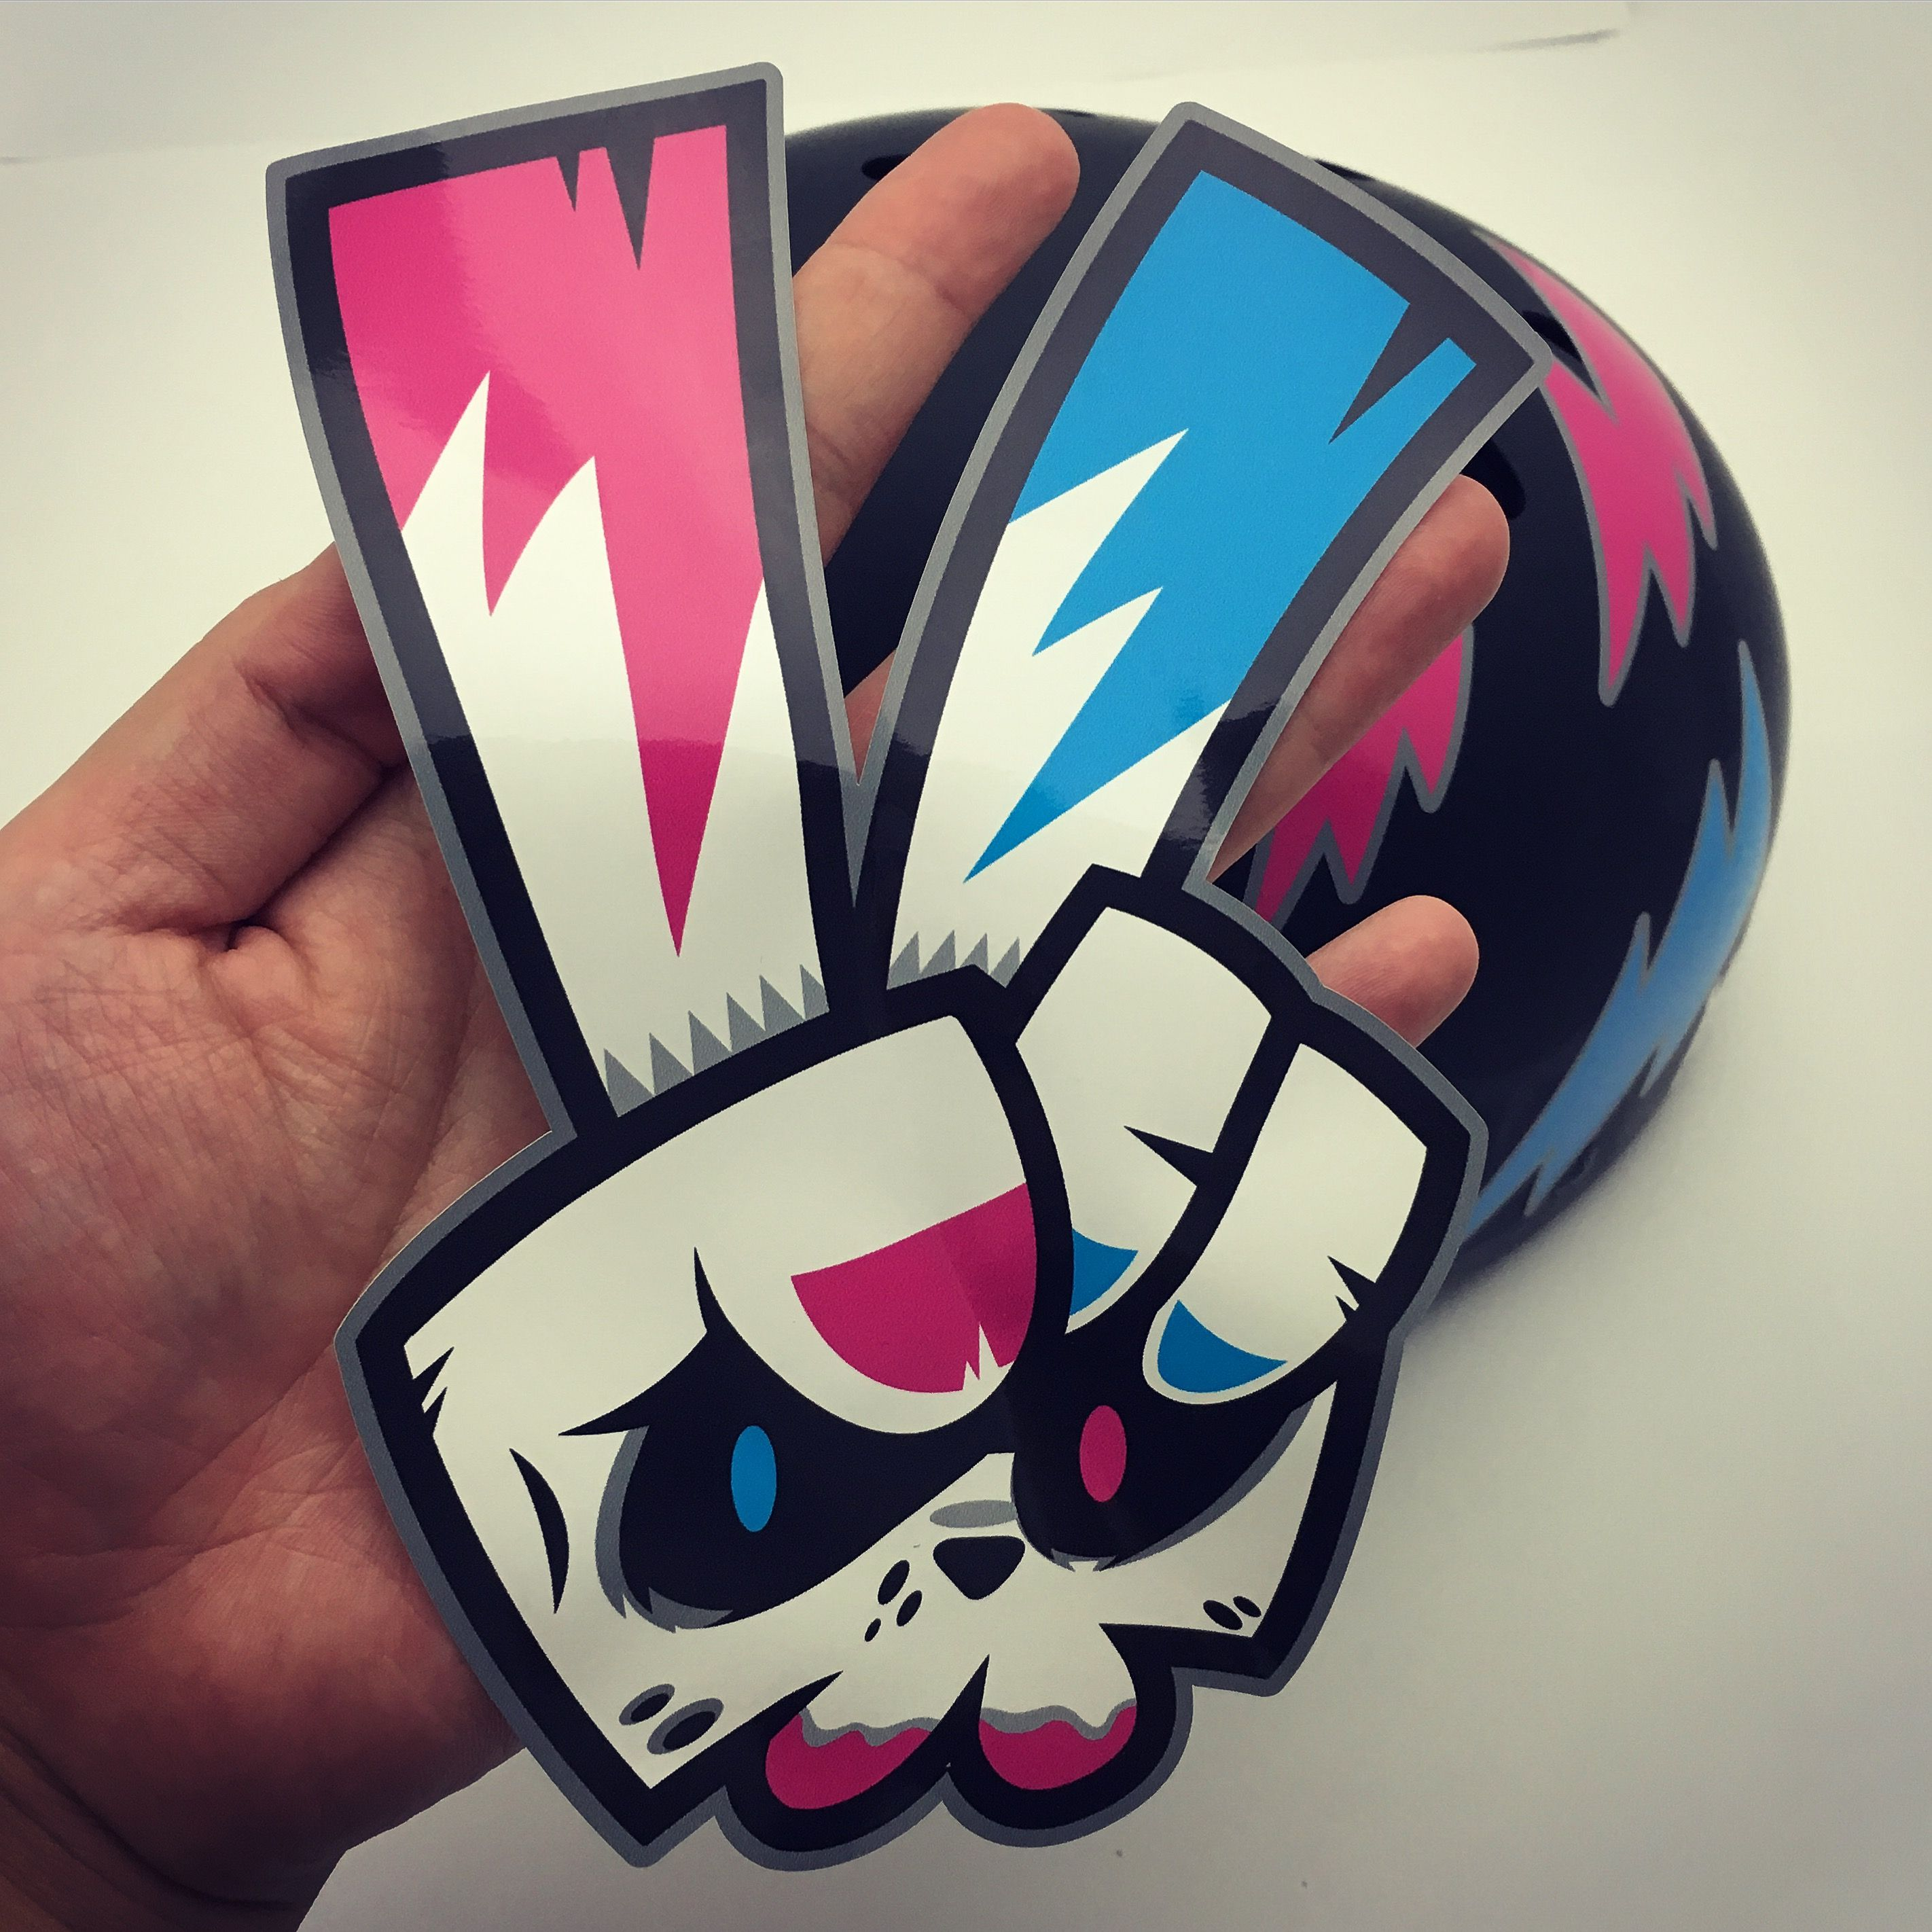 Bike rabbit. 'BABBITRUN' Extreme brand character snowboard helmet tuning sticker graphicer design. Designed by DOLDOL.  www.graphicer.com.  #Snowboard #skateboard #sk8 #longboard #surf #hiphop #bike #graphicer #mtb  #스노우보드 #롱보드 #그래피커 #토끼 #할리퀸 #헬멧 #graffiti #character #돌돌디자인 #일러스트 #rabbit #stickers #인스타그램 #스티커 #runing #illustration #헬멧스티커 #helmet #스노우보드스티커 #바빗런 #babbitrun #헬멧튜닝 #캐릭터디자인 #캐릭터 #doldoldesign